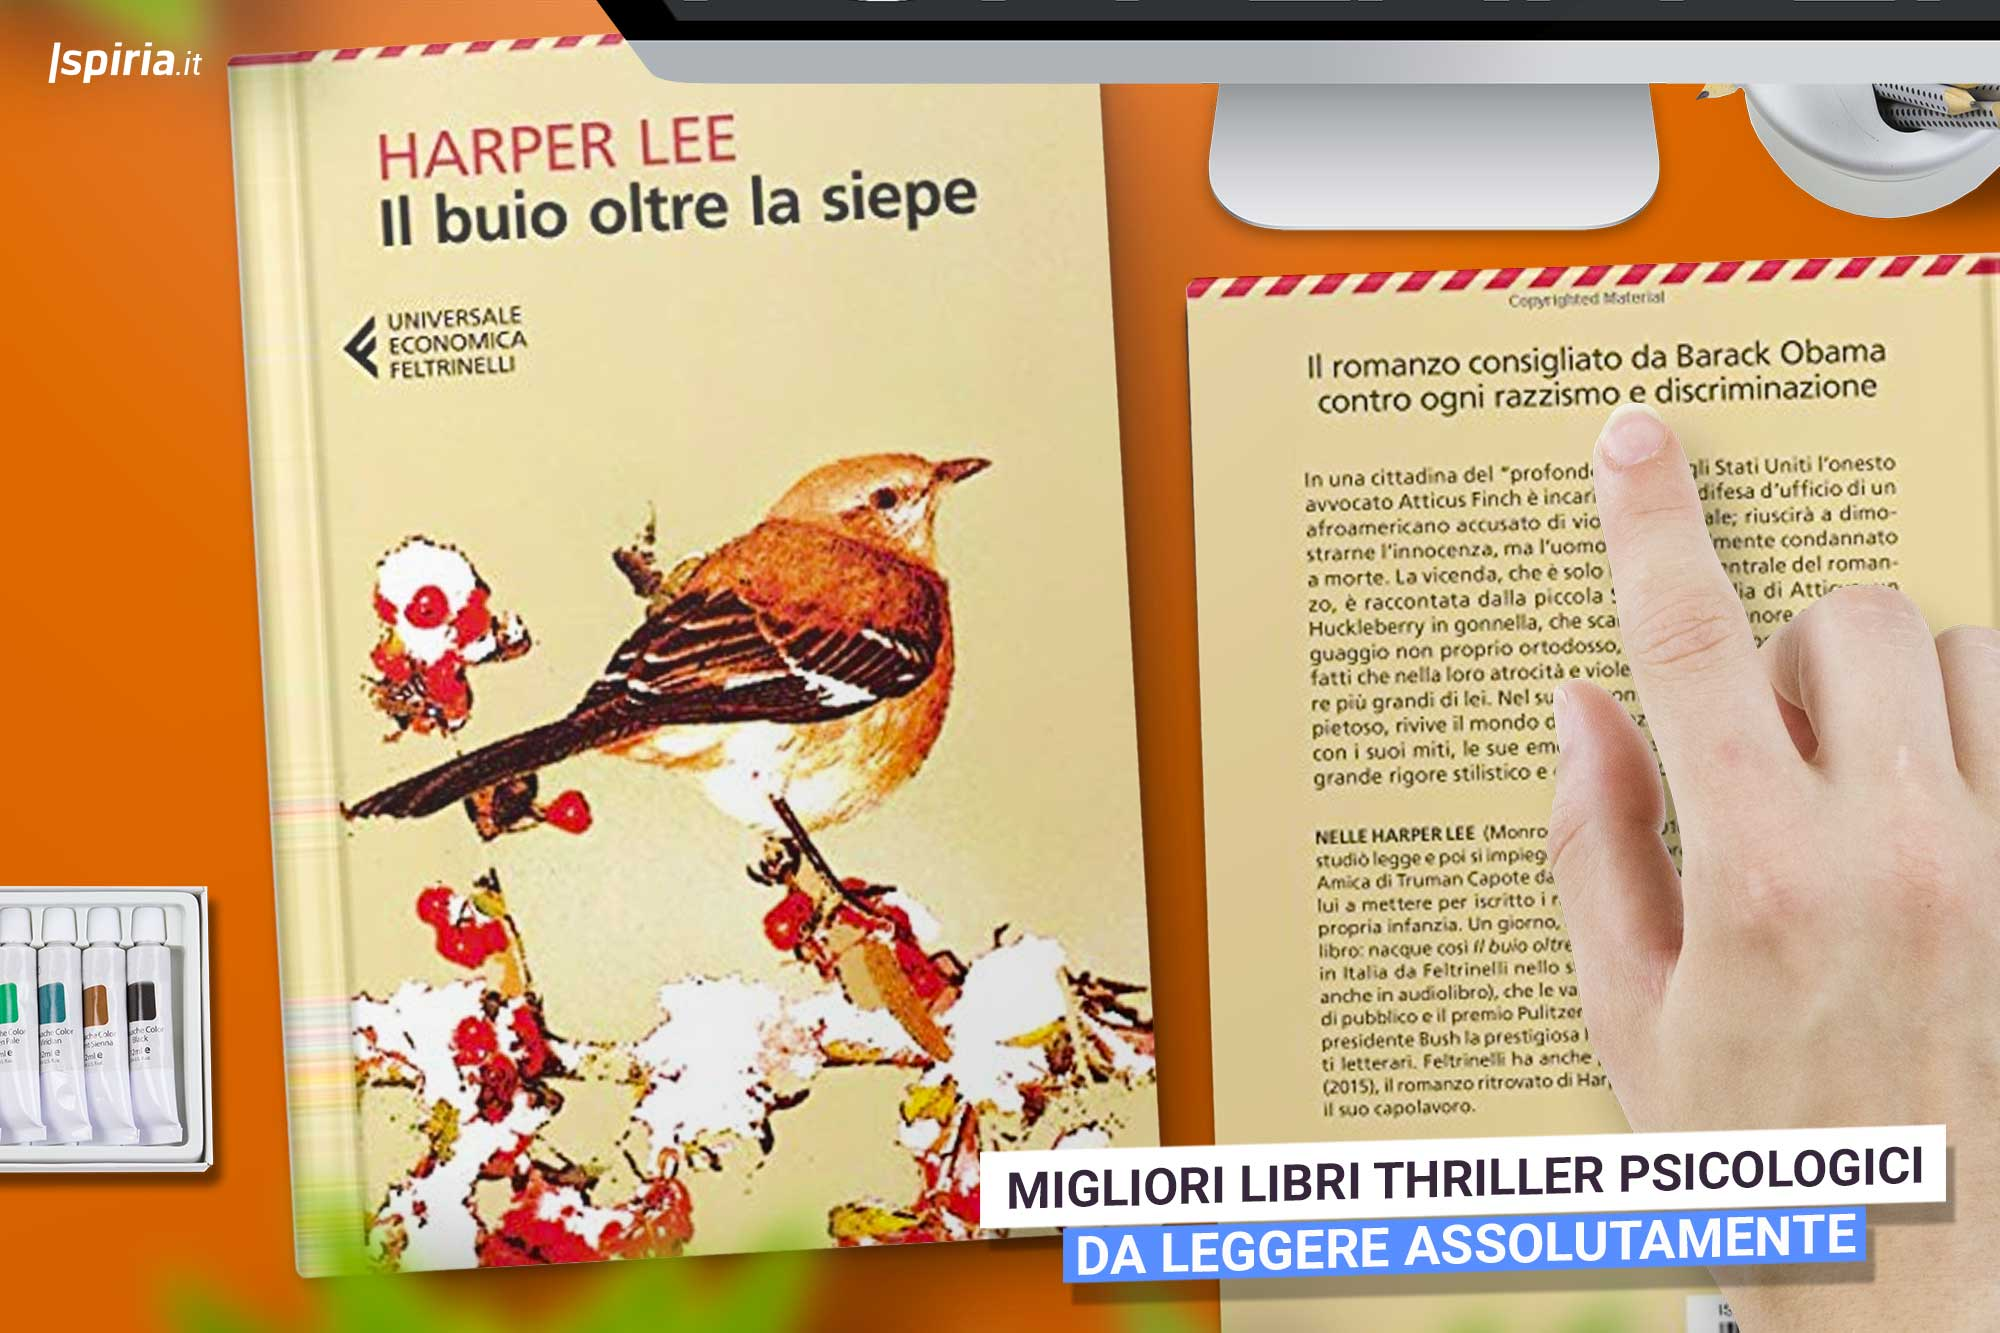 Migliori-libri-thriller-buio-oltre-la-siepe